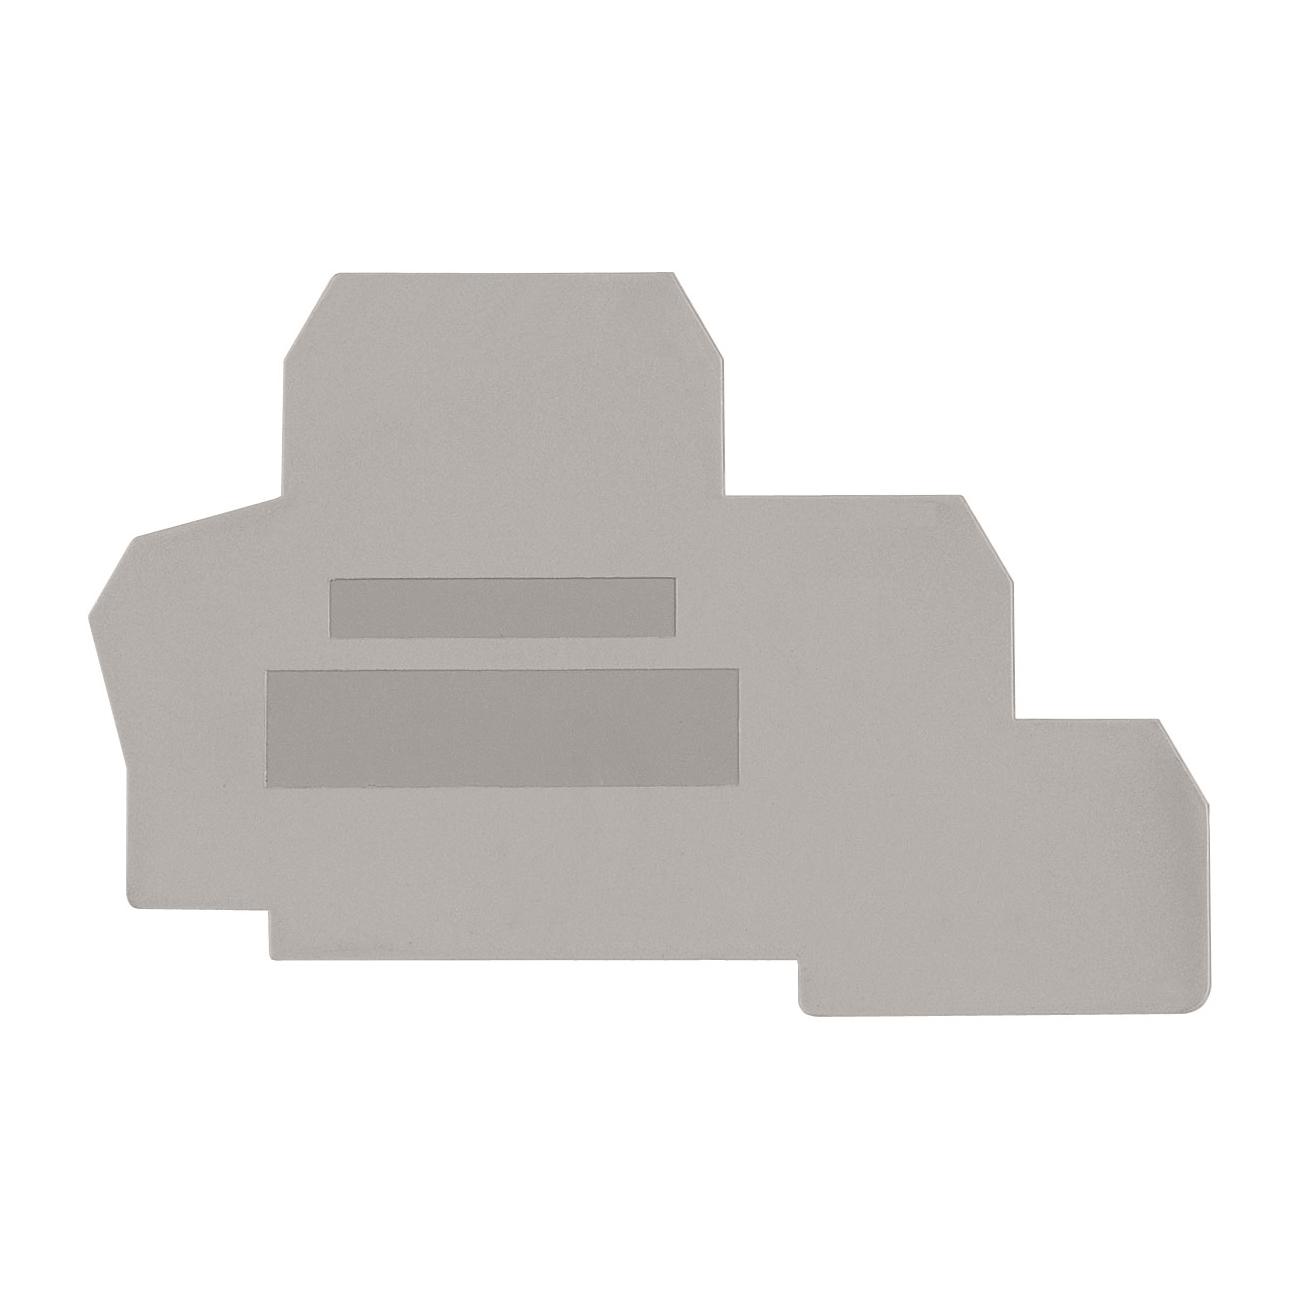 1 Stk Endplatte für Dreistockklemmen PUK 2 T grau IK680202--